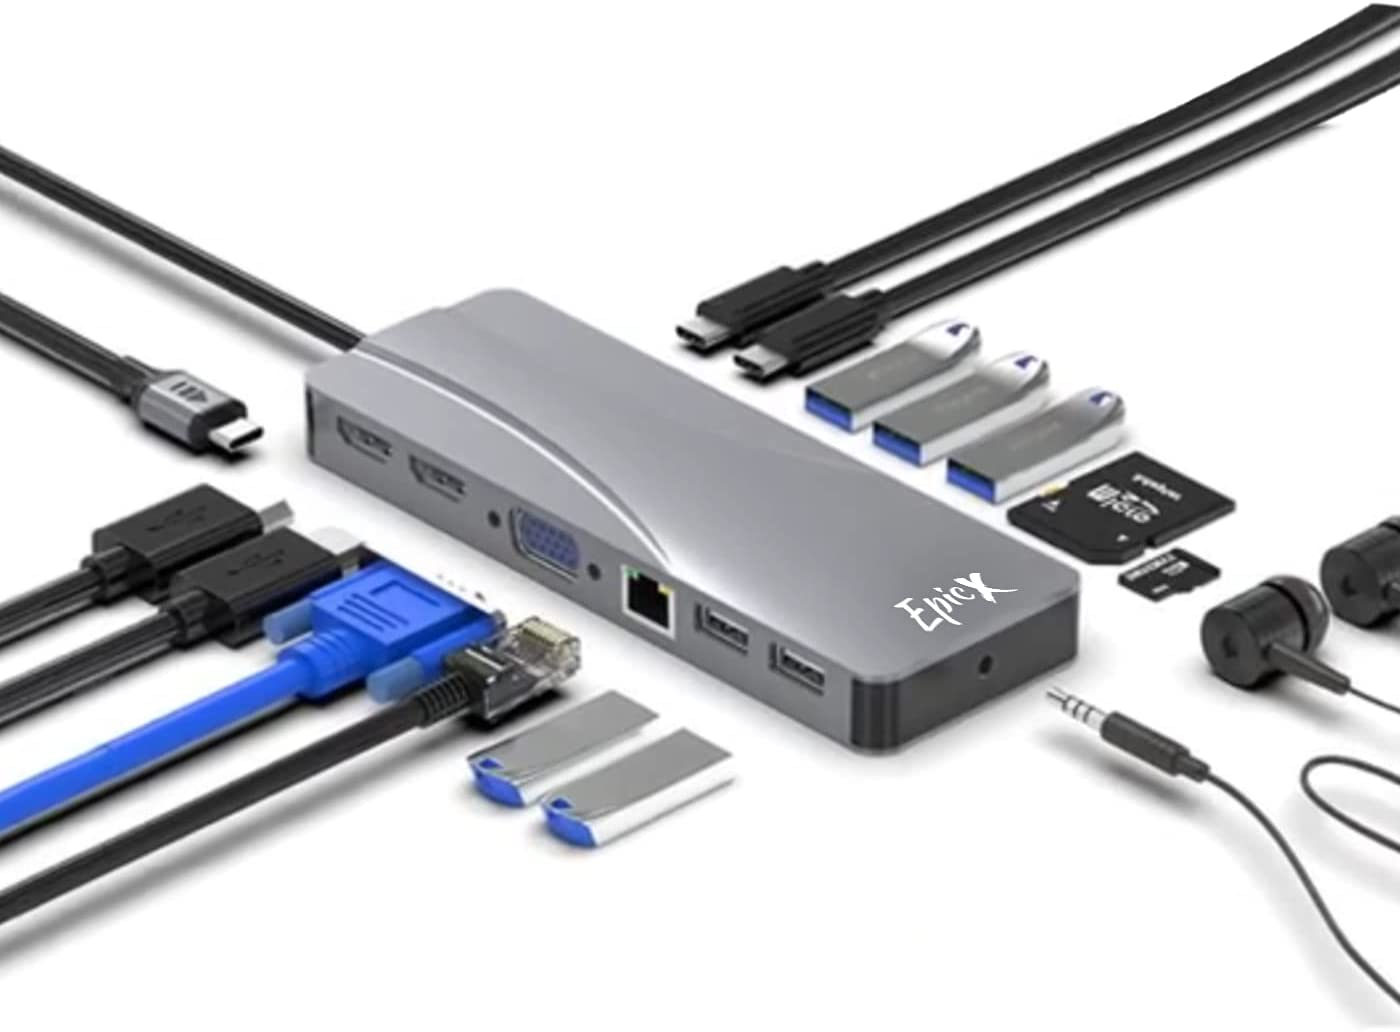 USB C Hub - 14 in 1 Laptop Docking Station - Multipurpose Docking Station for MacBook and Windows Laptops - Minimalist USB Type C Hub with 2 x 4K HDMI Output, 1 x VGA Output, Card Reader, 3 x USB 3.0